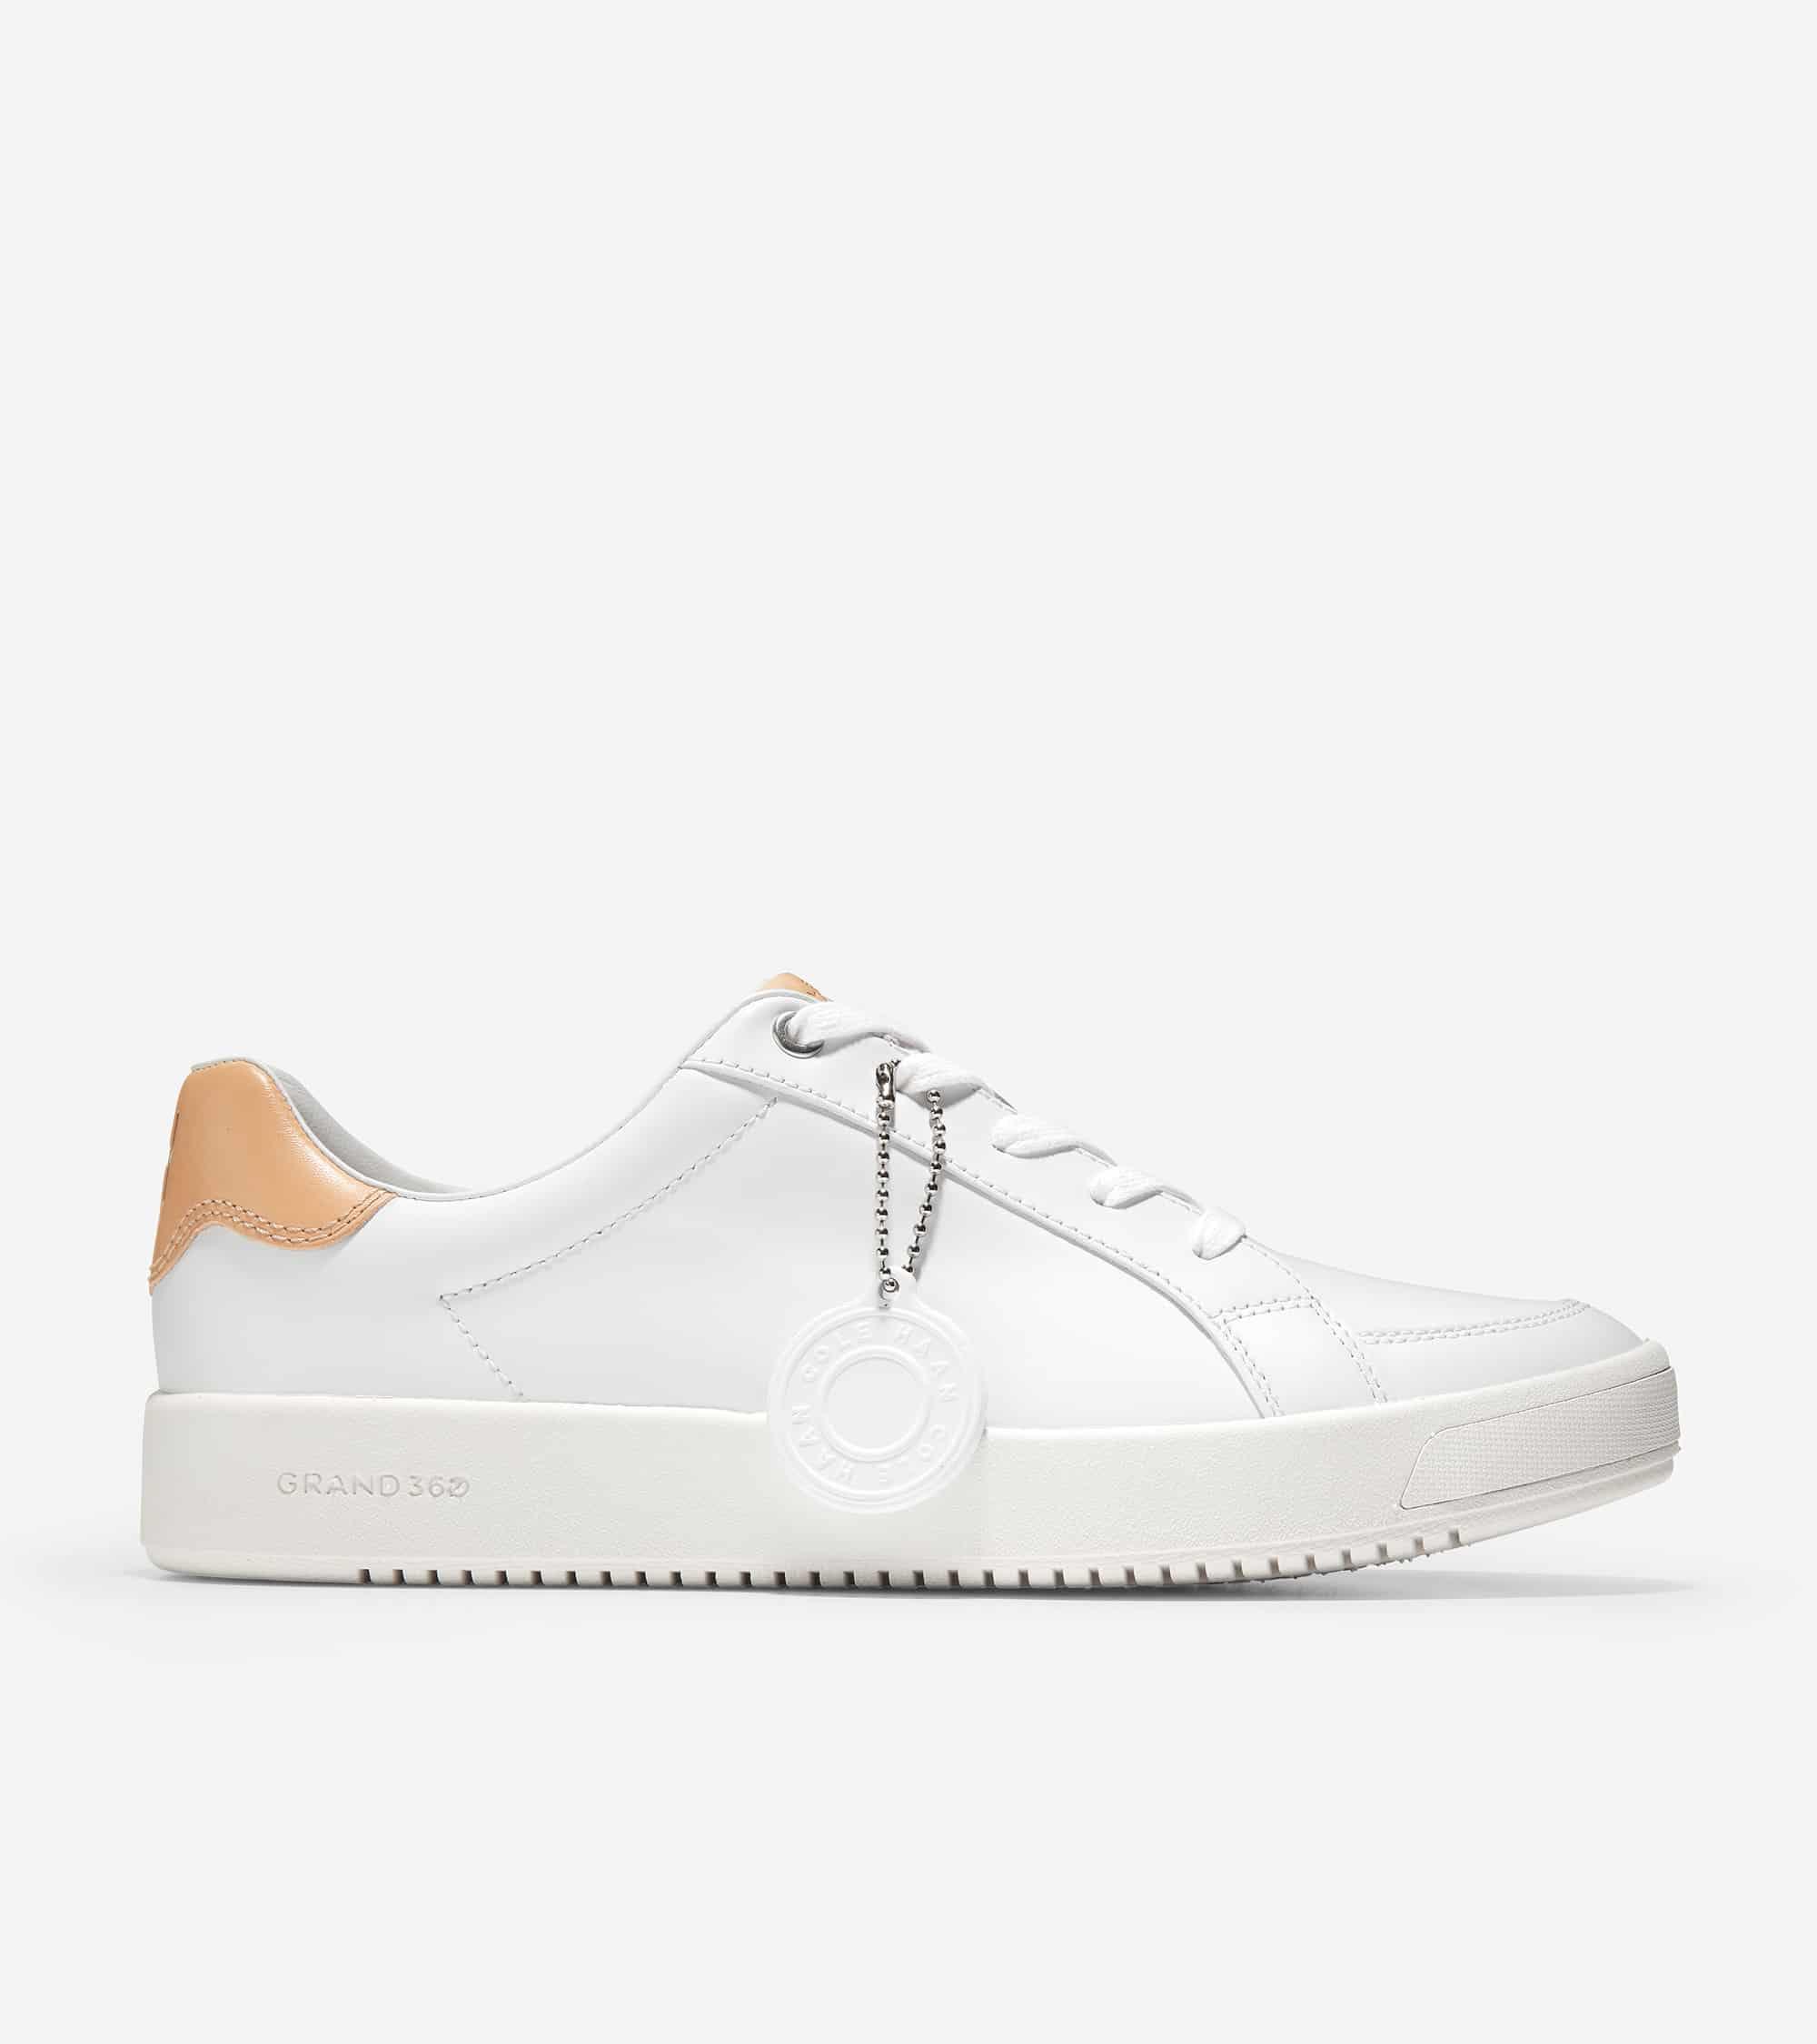 Cole Haan Grandprø Finalist Sneaker White Eco Rebound Leather/ Optic White